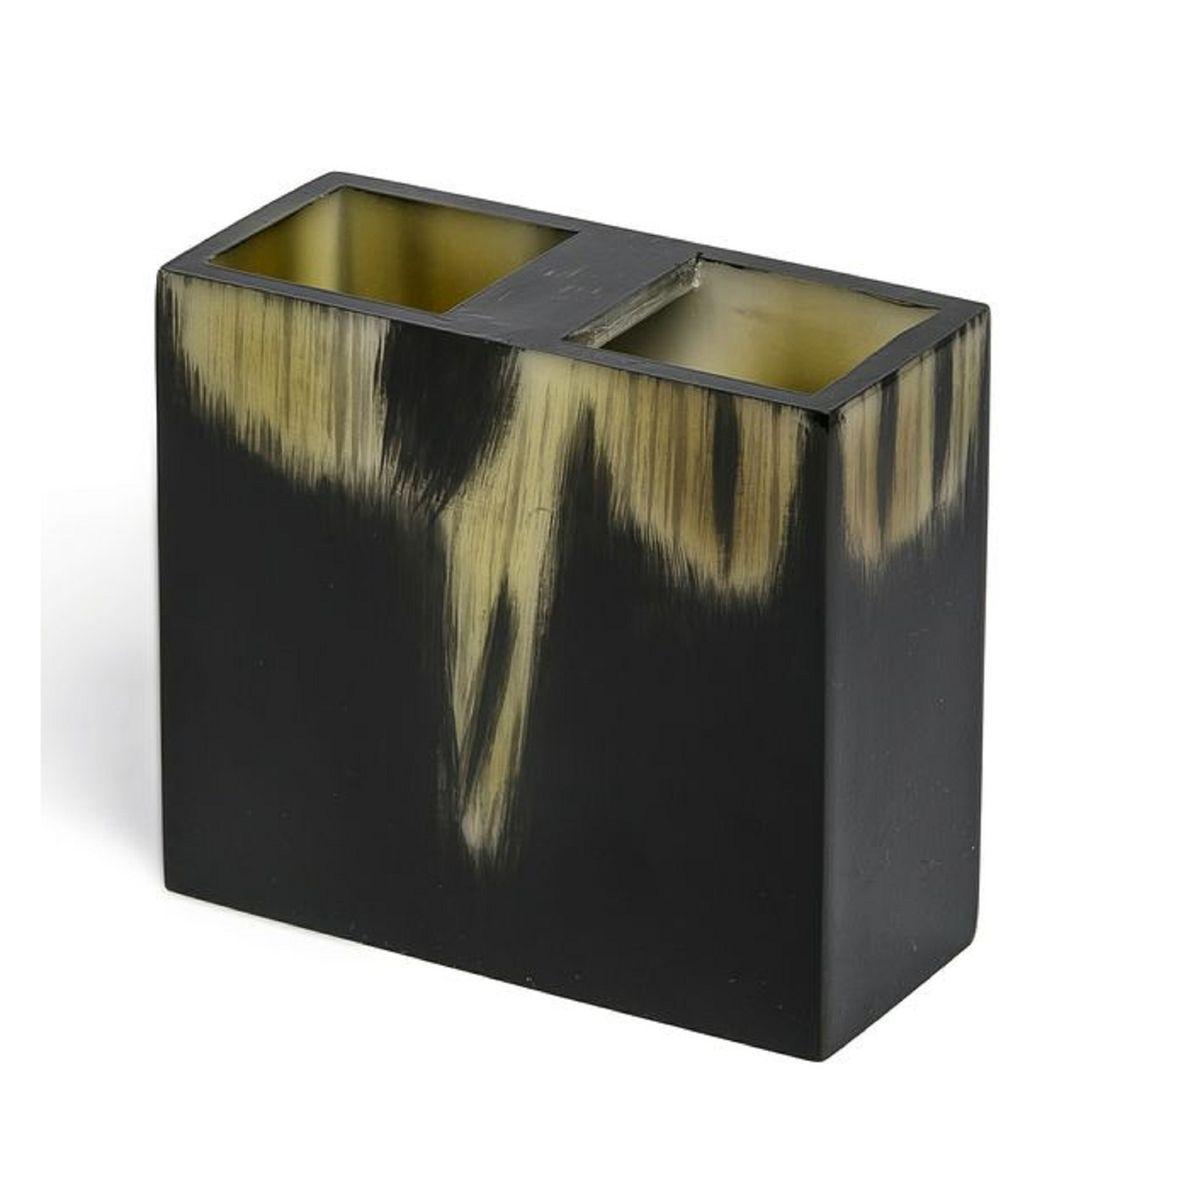 Стаканы для зубных щеток Стакан для зубных щёток Kassatex Aspen stakan-dlya-zubnyh-schyotok-aspen-ot-kassatex-ssha-kitay.jpeg